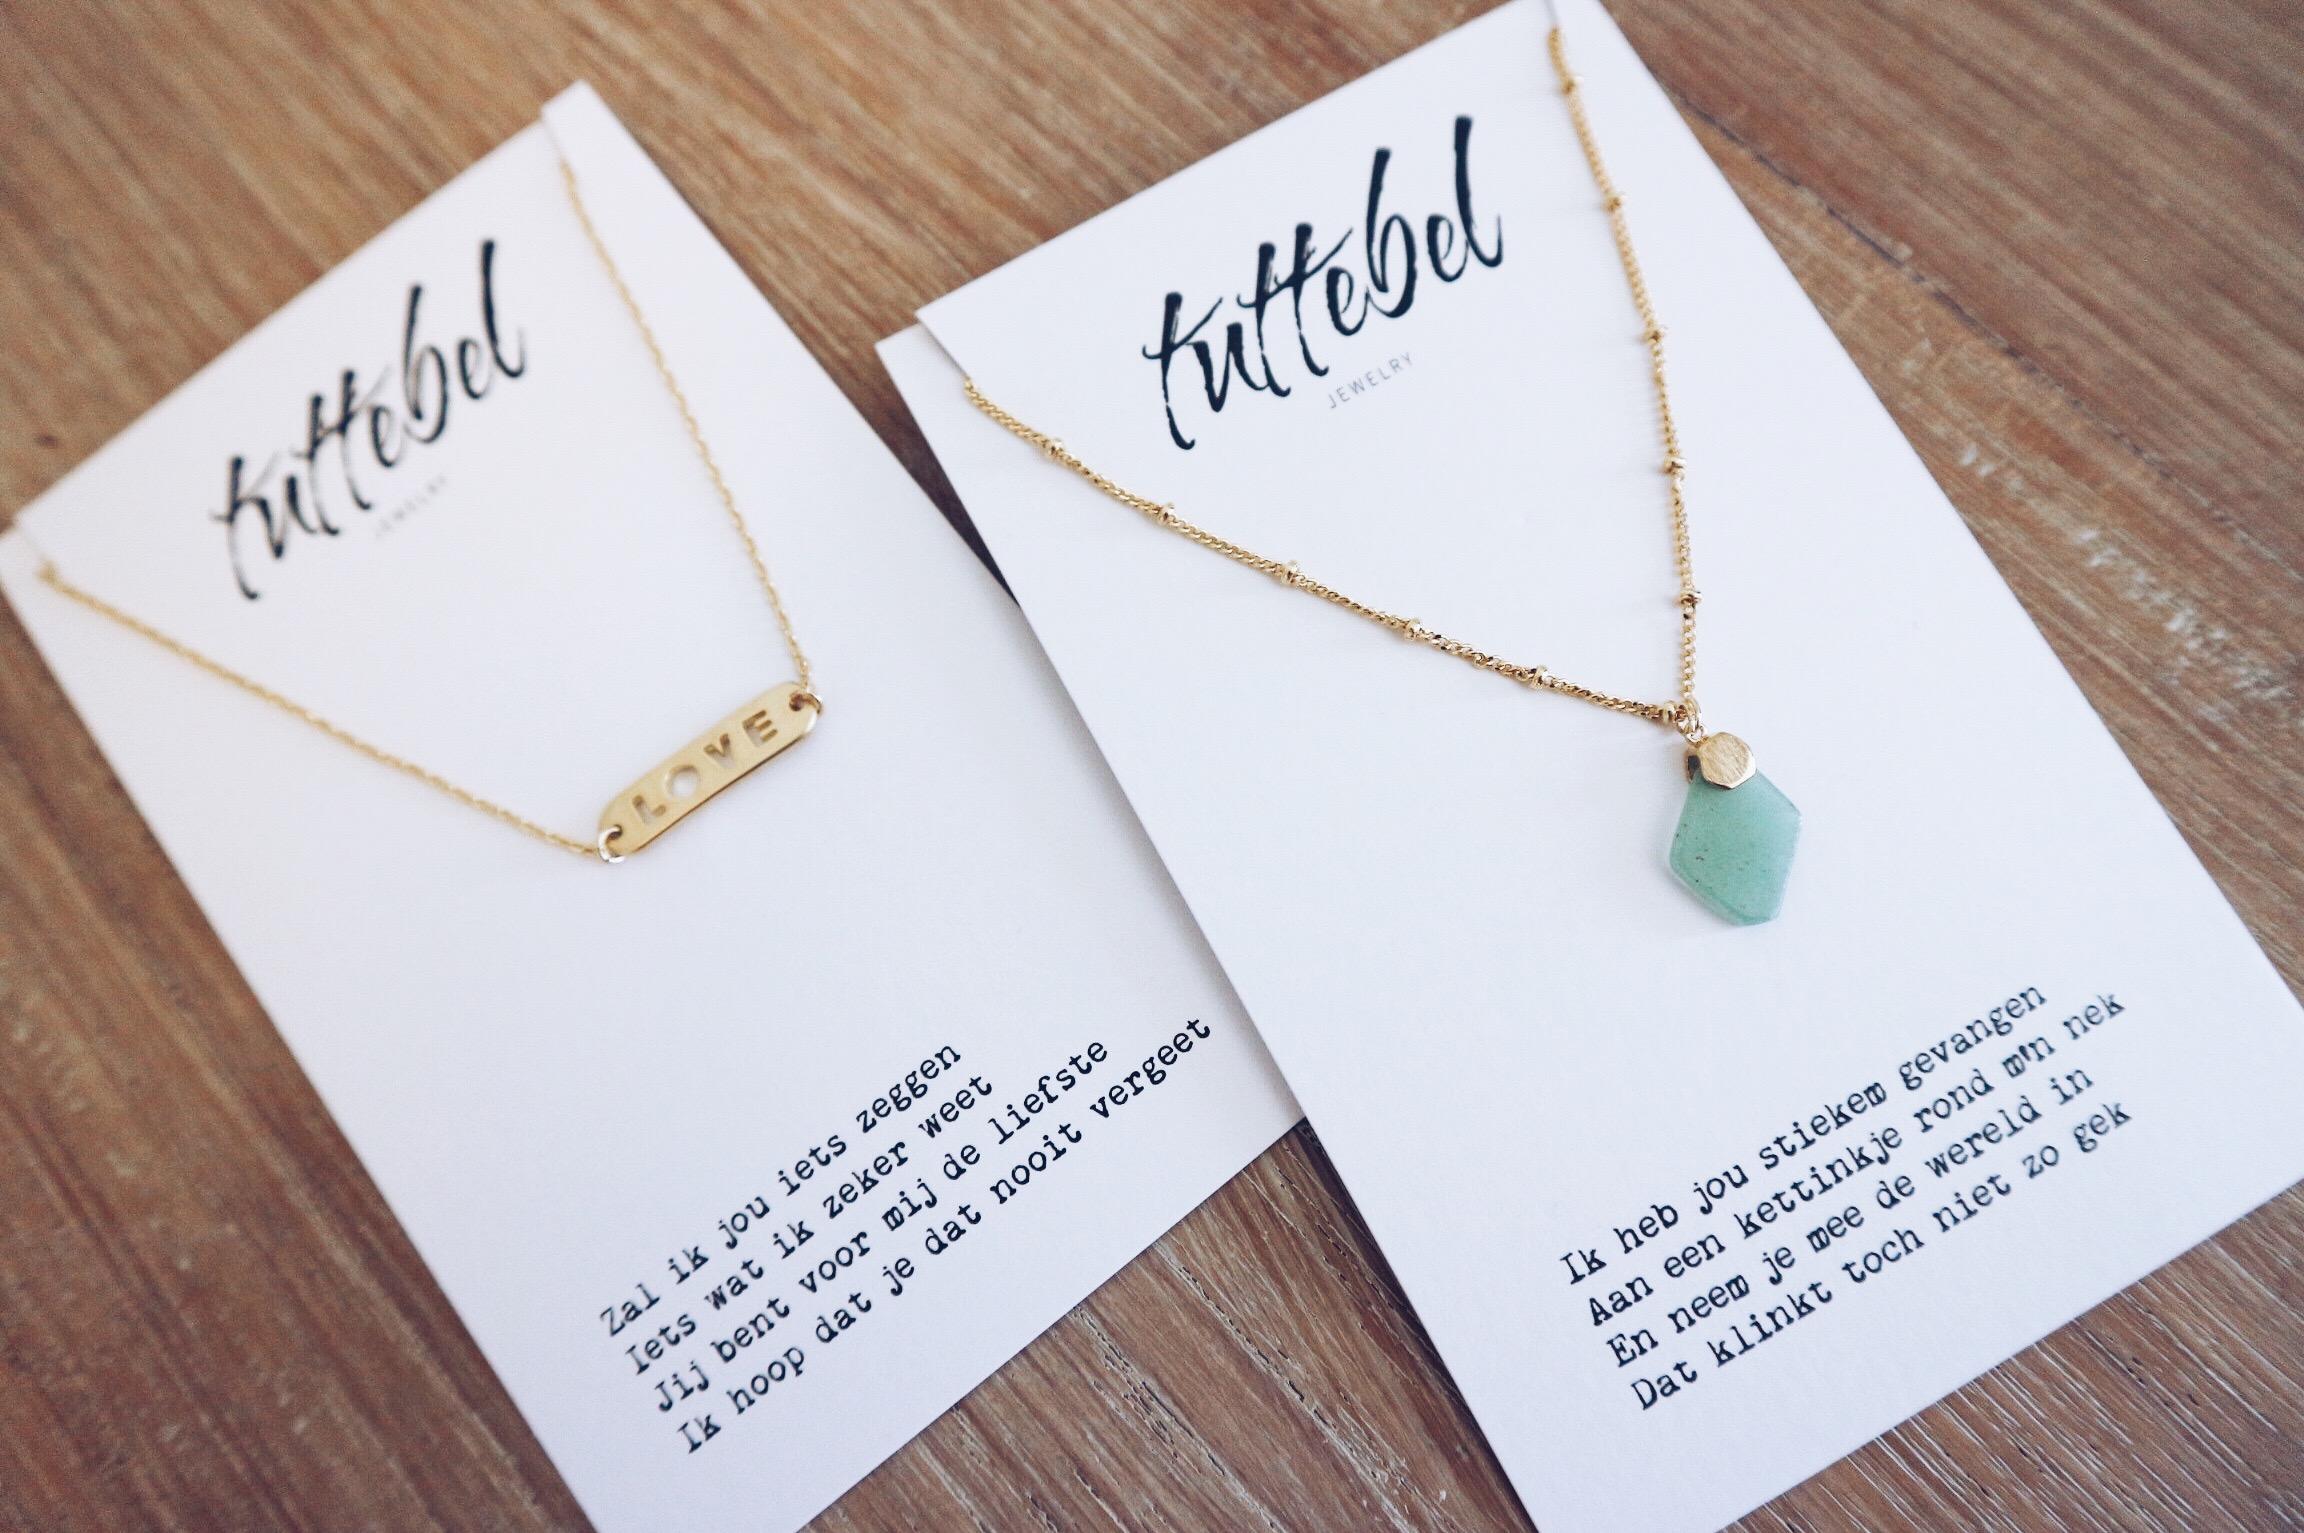 Tuttebel, initial, ketting, necklace, naam, kraamcadeau, bff, bestie, cadeau, cadeautje, naamketting, letter, webshop, xmariekie, blog, blogger, winactie, giveaway